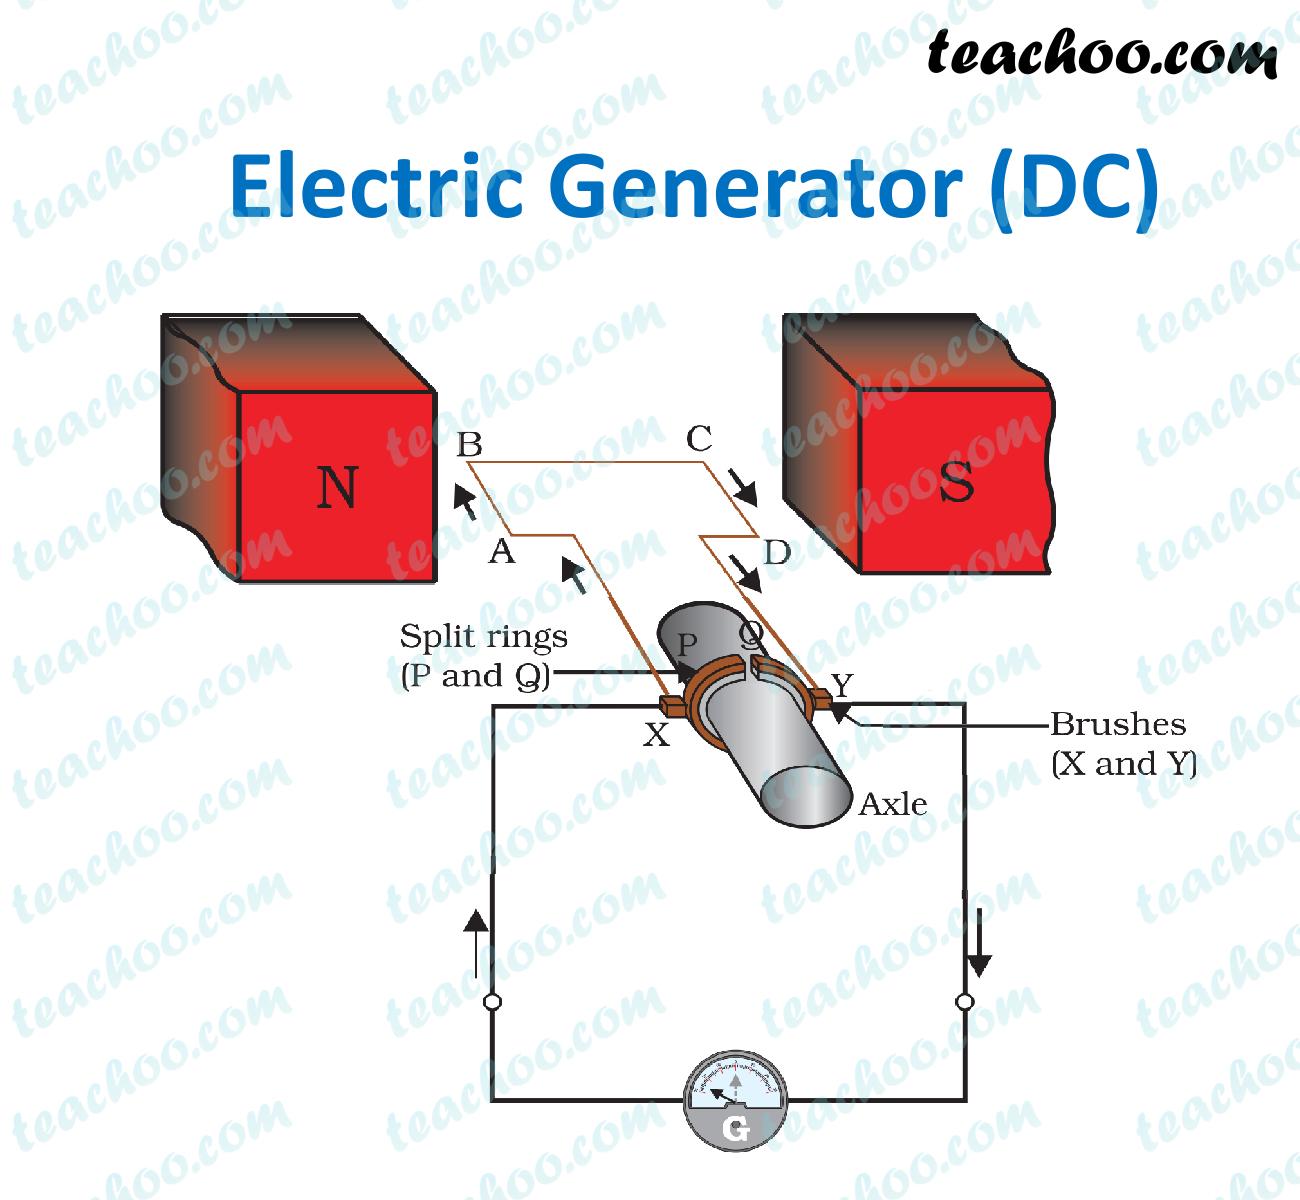 dc-electric-generator---teachoo.jpg